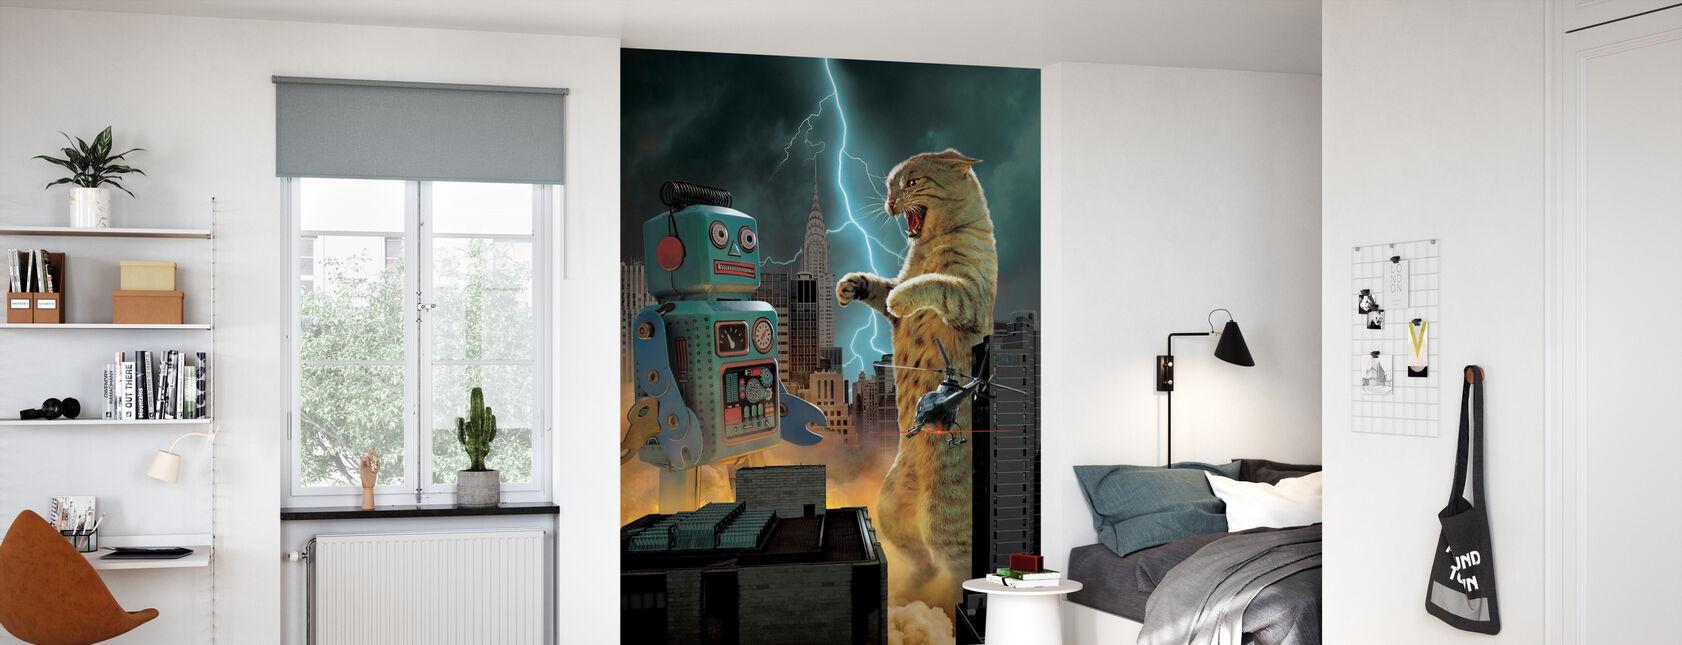 Catzilla vs Robot - Tapet - Barnrum